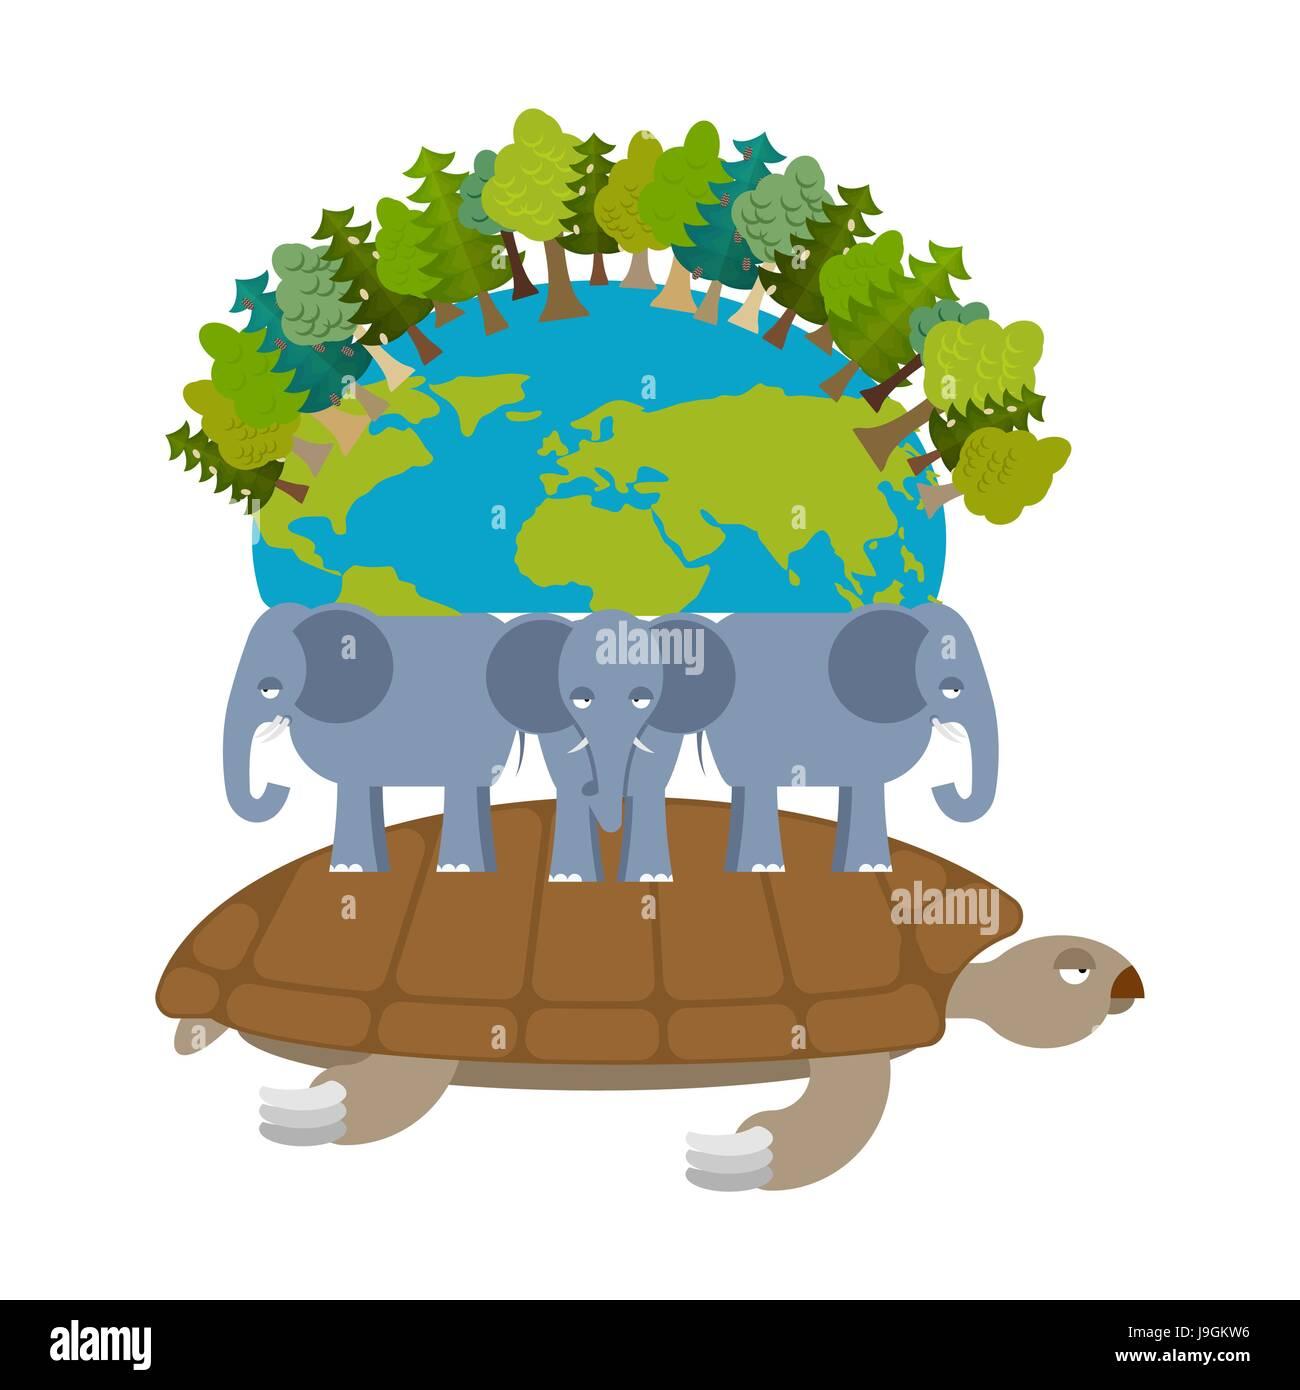 Mythological Planet Earth Turtle Carrying Elephants Ancient Representation Of World